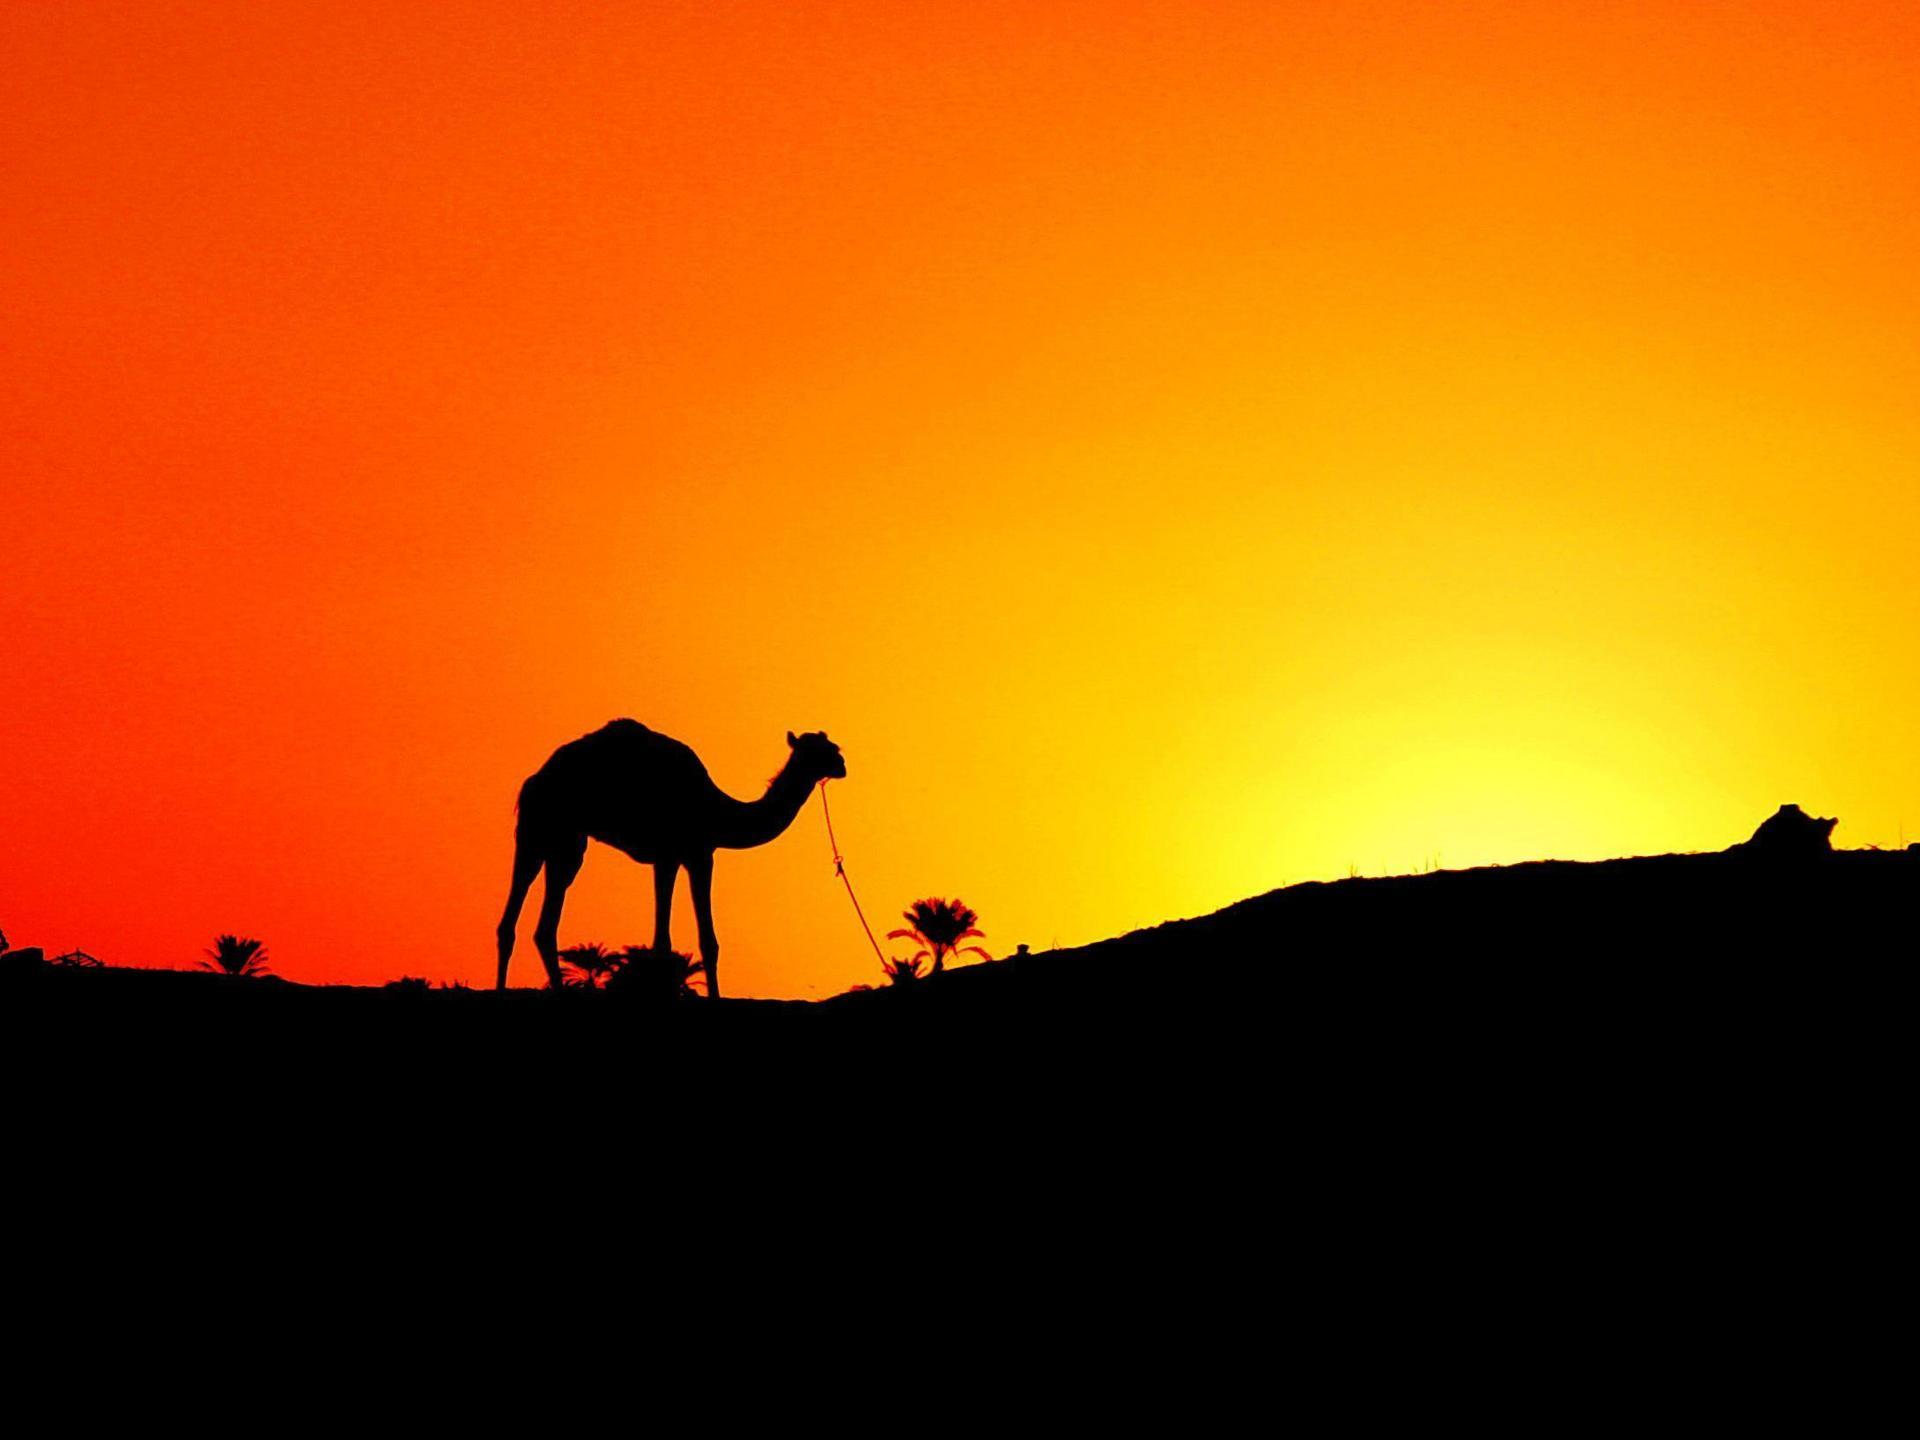 Camel HD